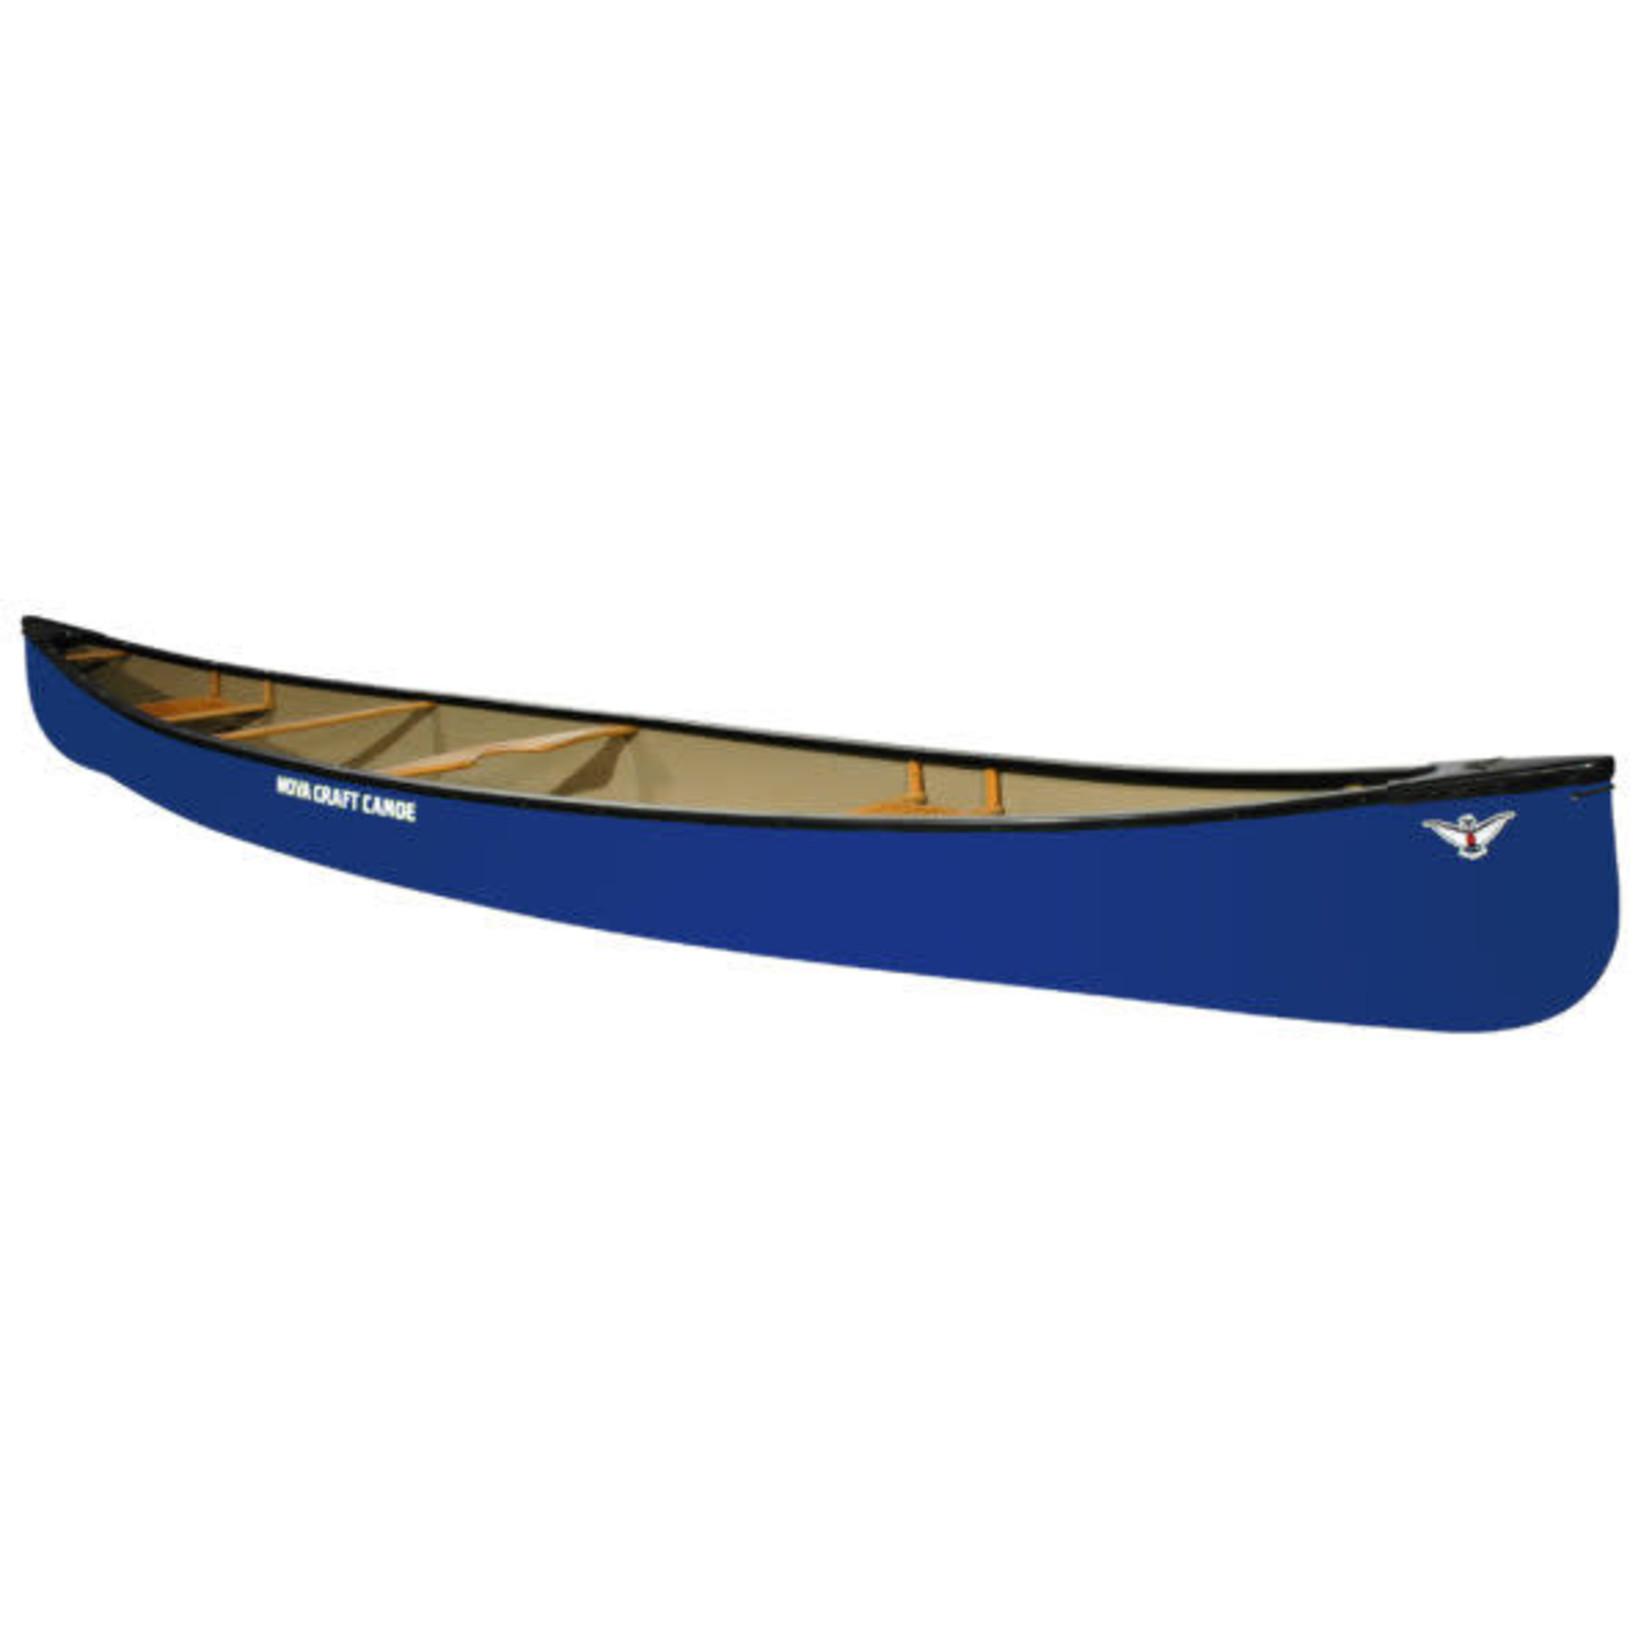 NovaCraft Prospector 16 - Fiberglass - Blue